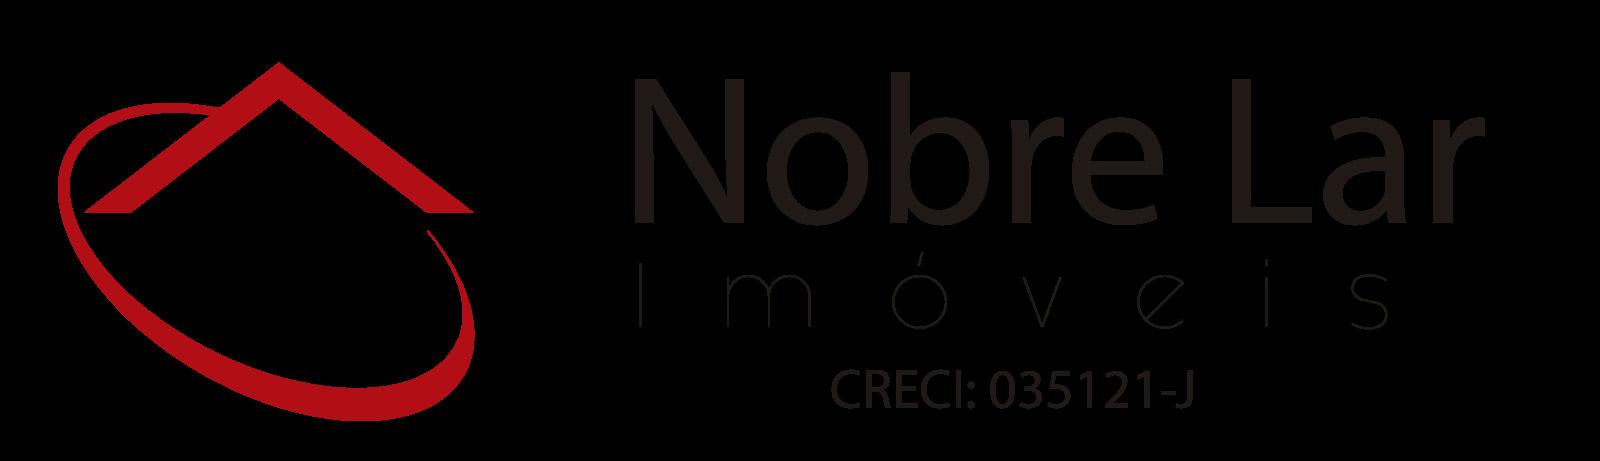 Nobre Lar Imóveis - CRECI: 035121-J